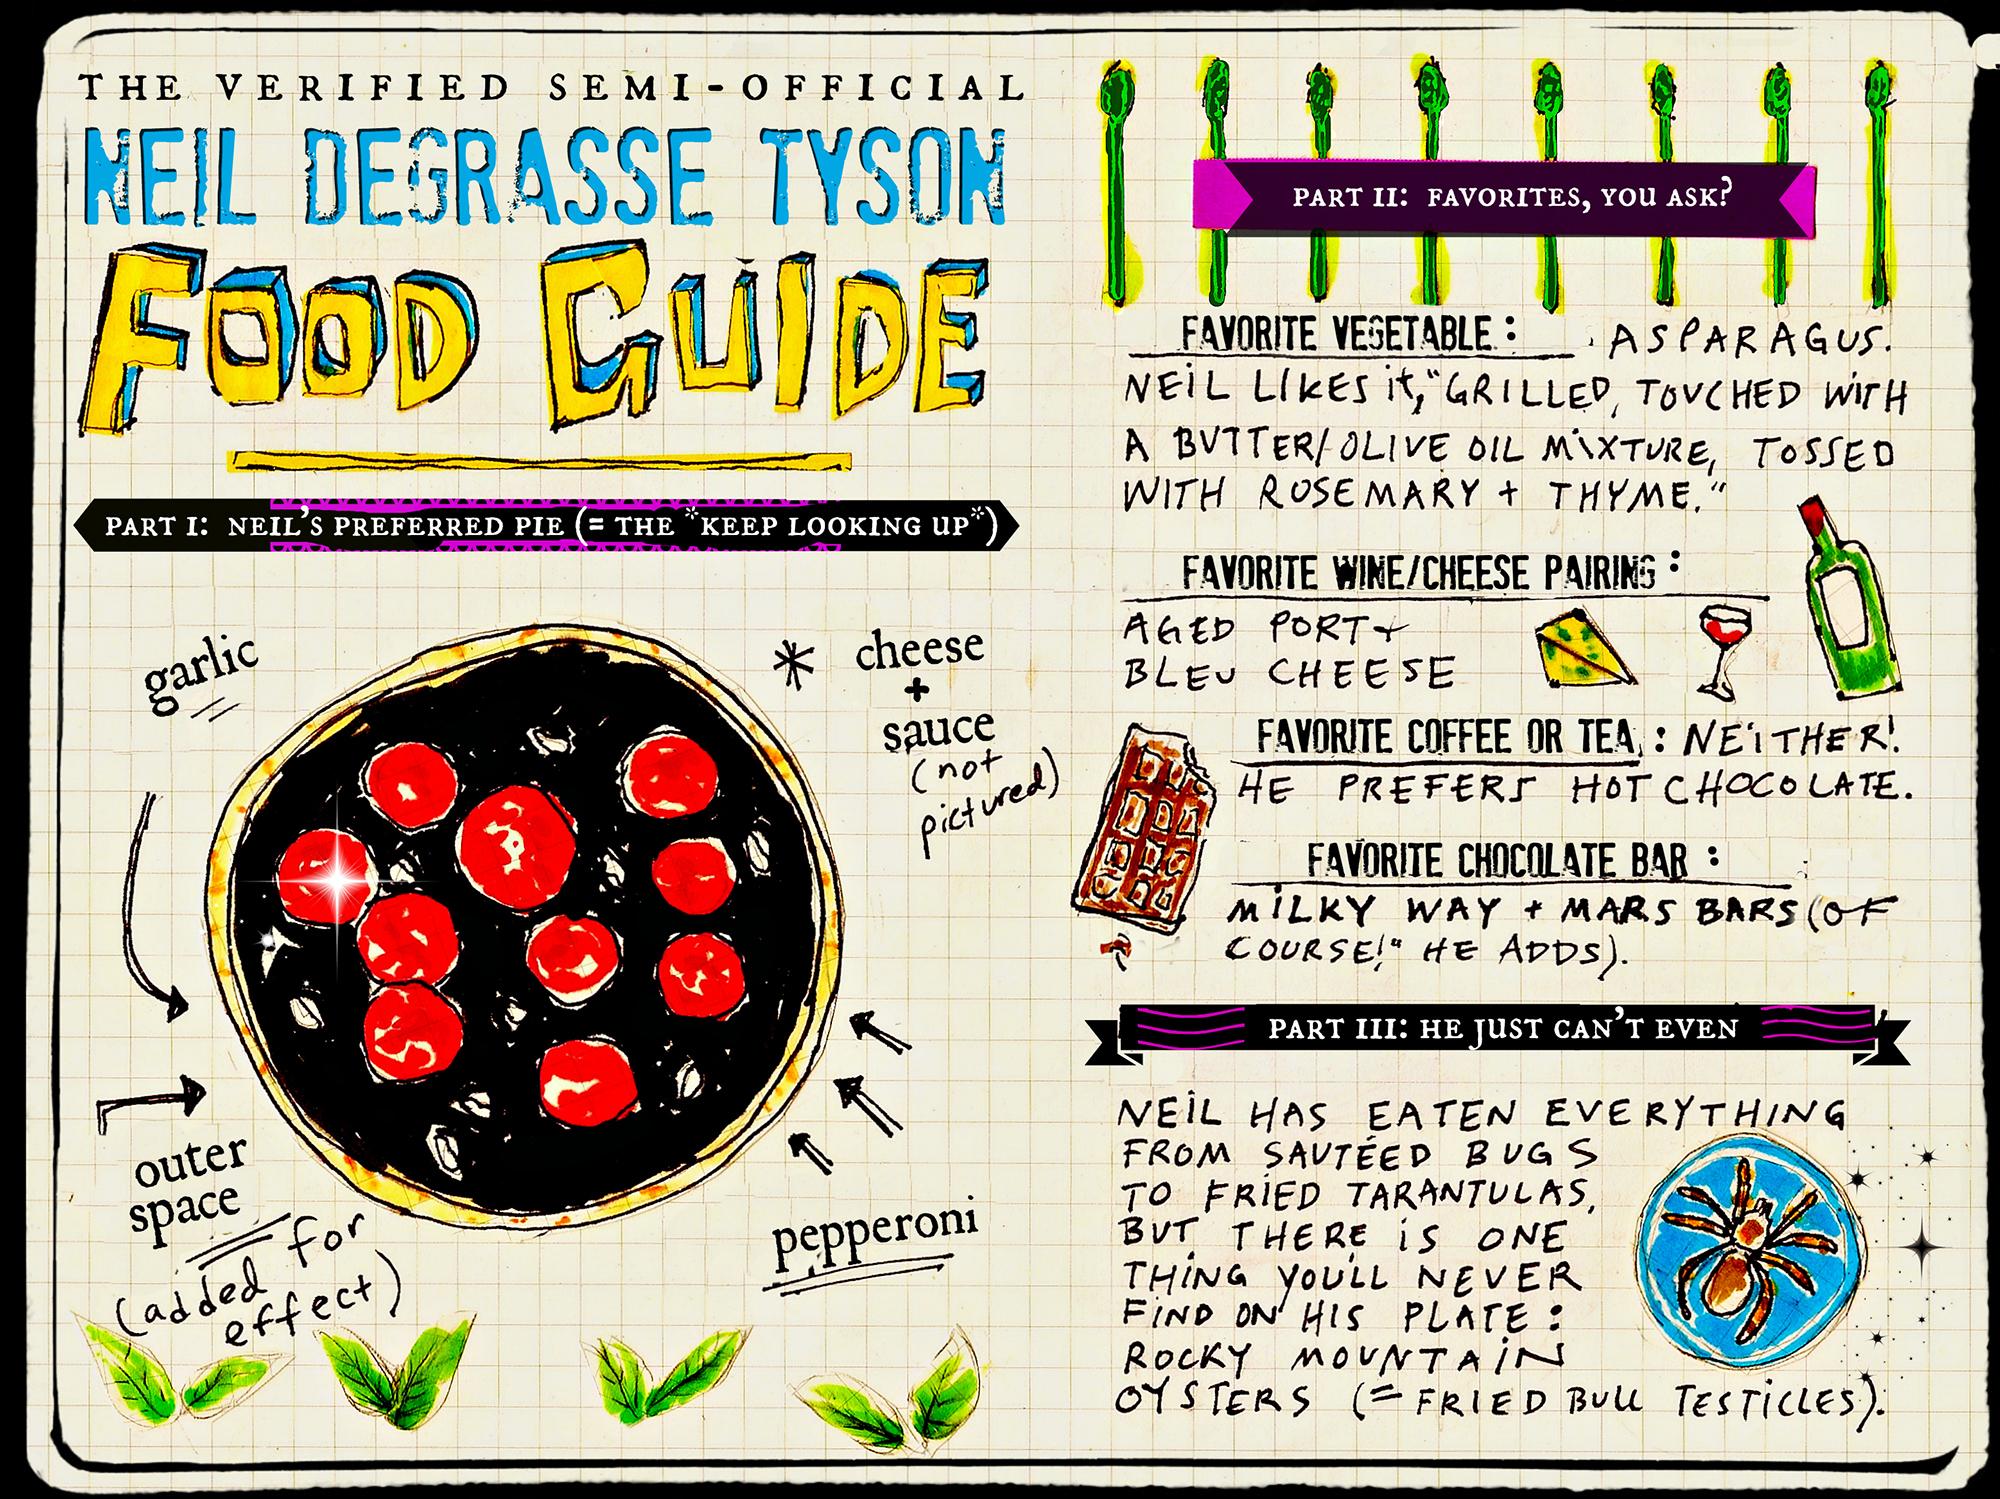 Neil Degrasse Tyson Food Guide